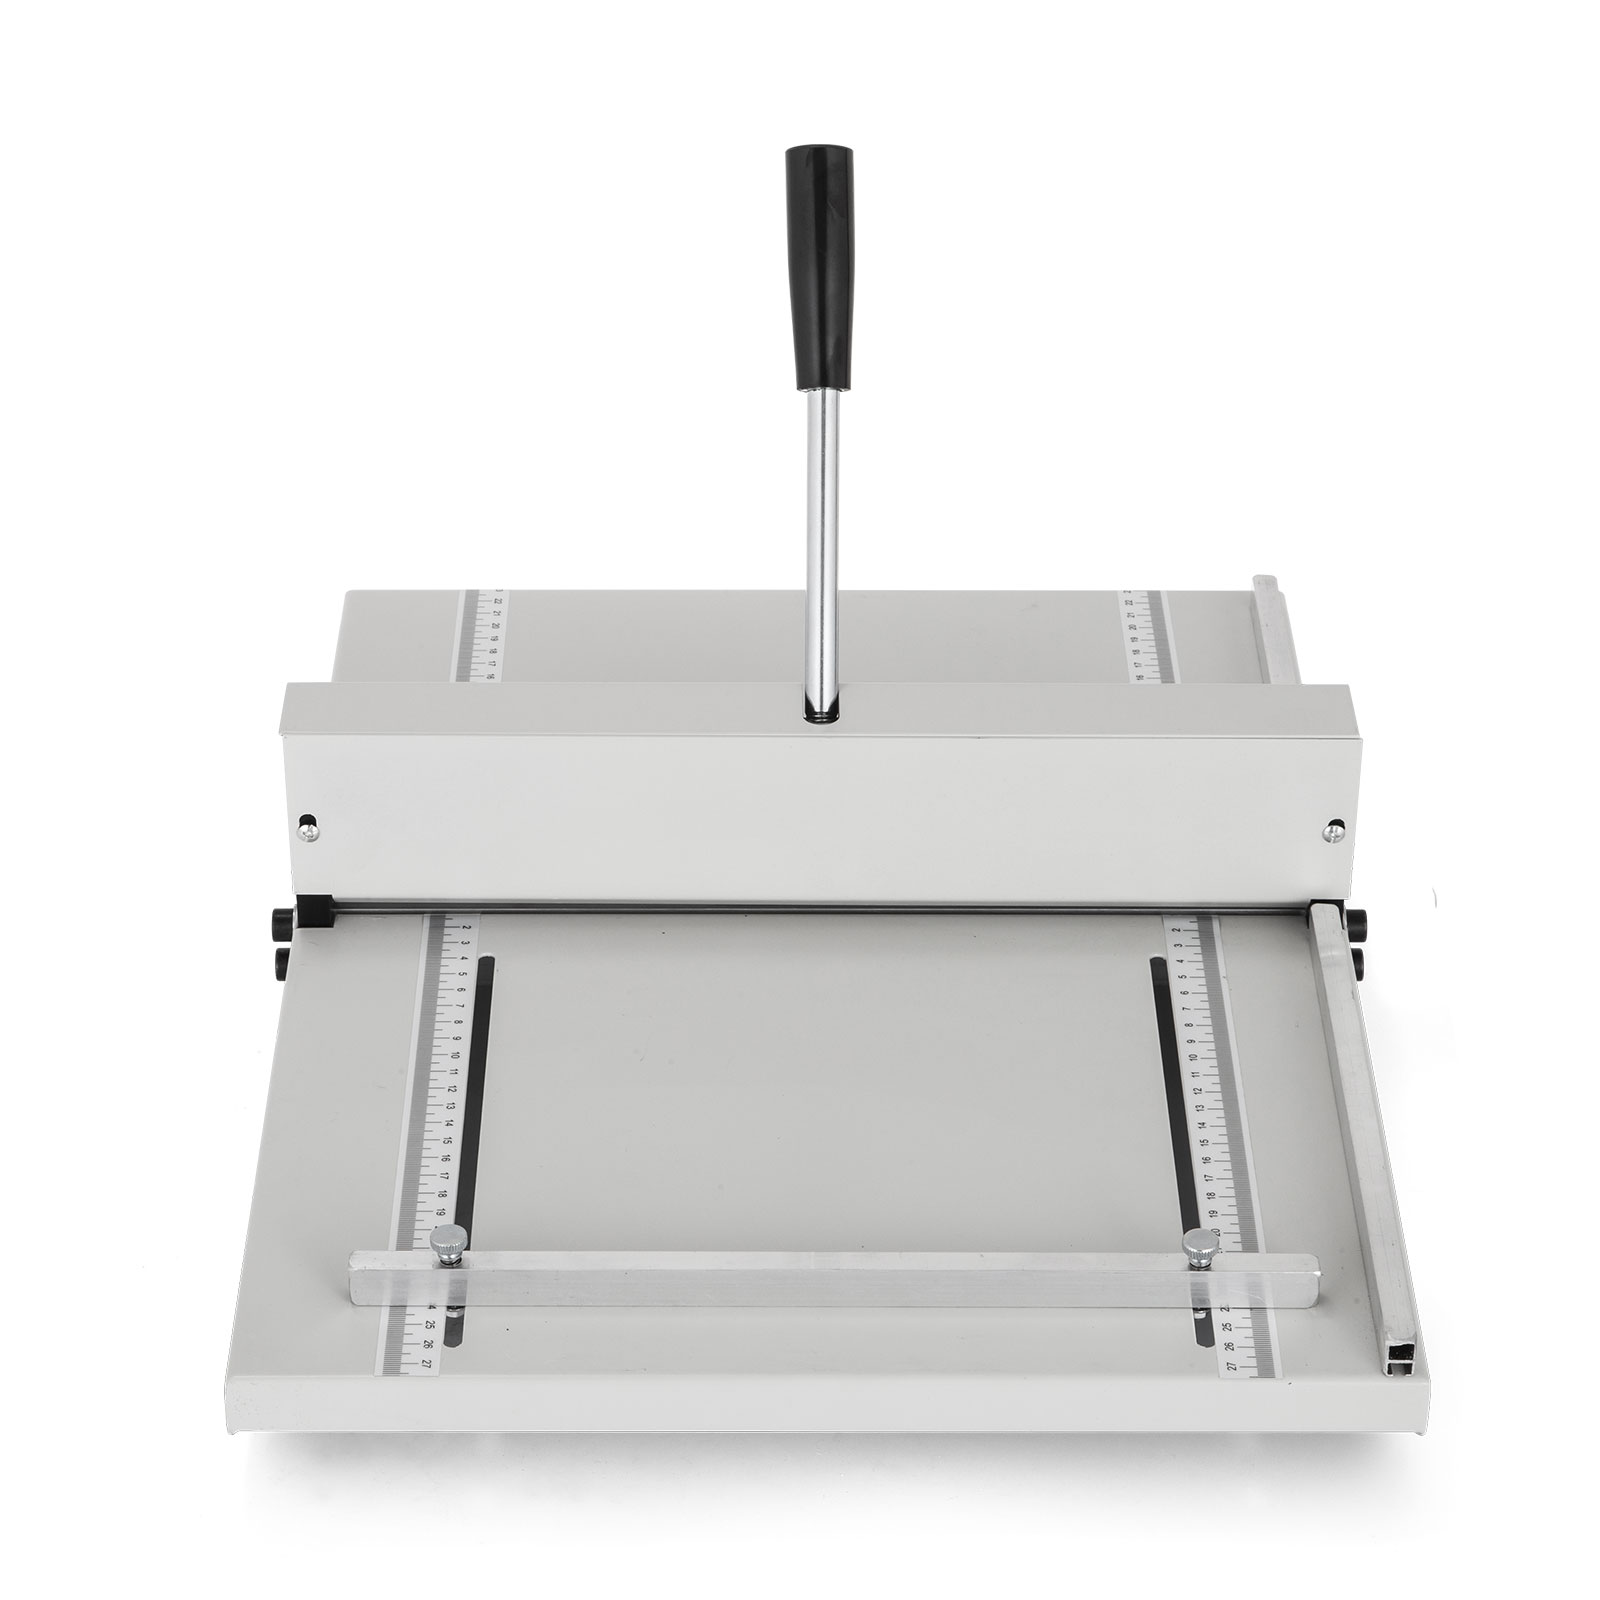 Cordonatrice-Perforatrice-Max-350-520mm-Profondita-Regolabile-Elettrica-Manuale miniatura 63